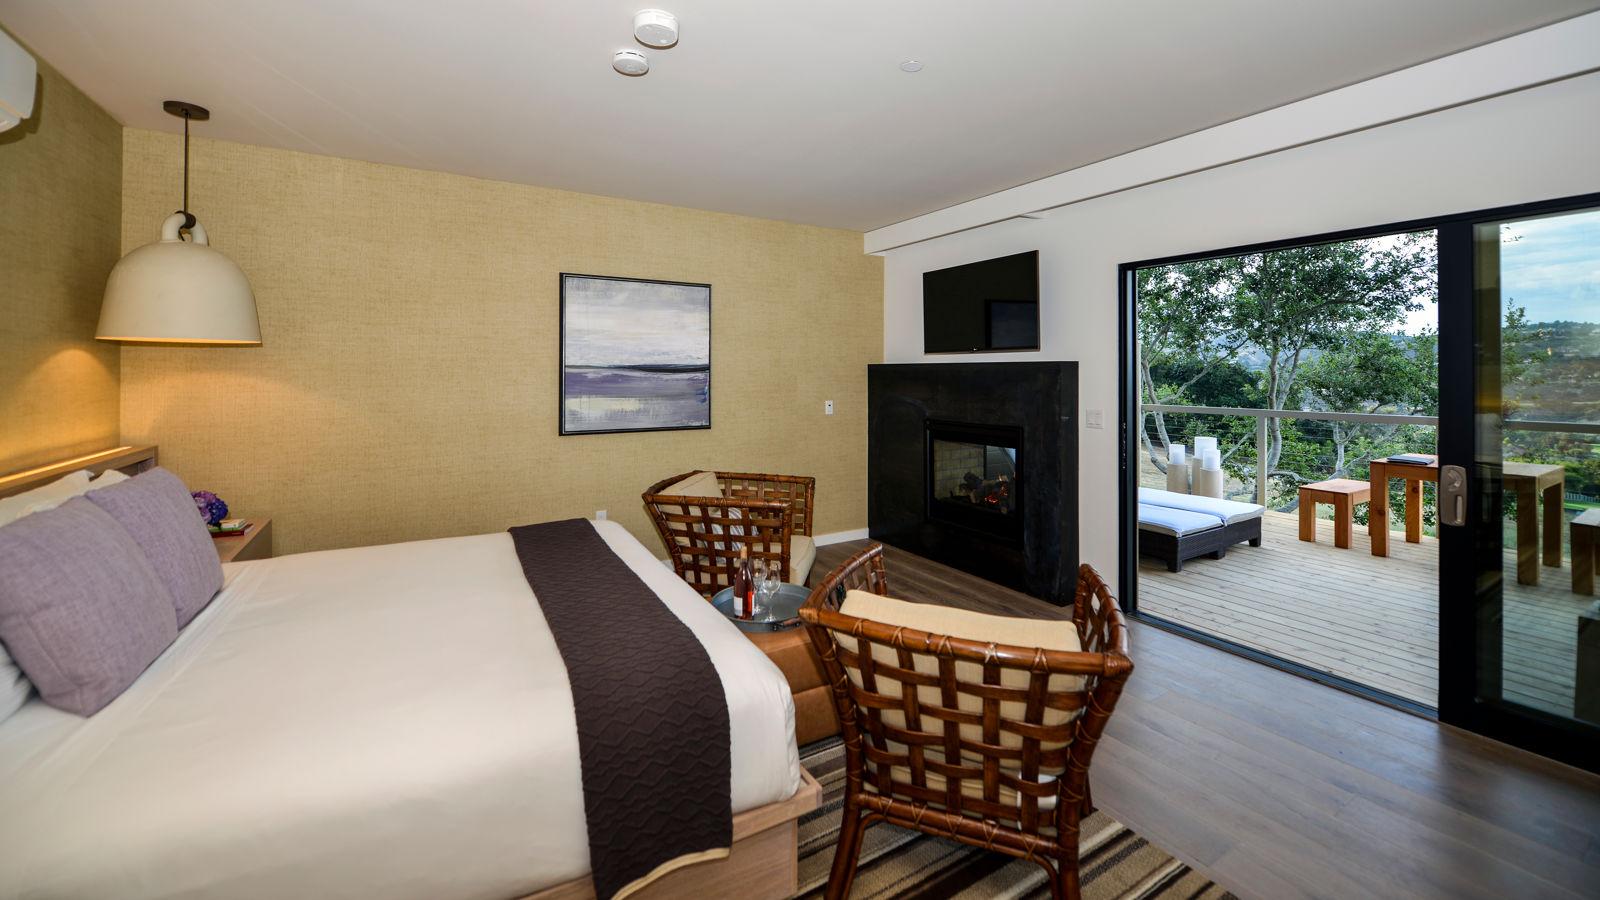 Carmel Valley Ranch_Accommodations_Vineyard Oak Studio_BR view